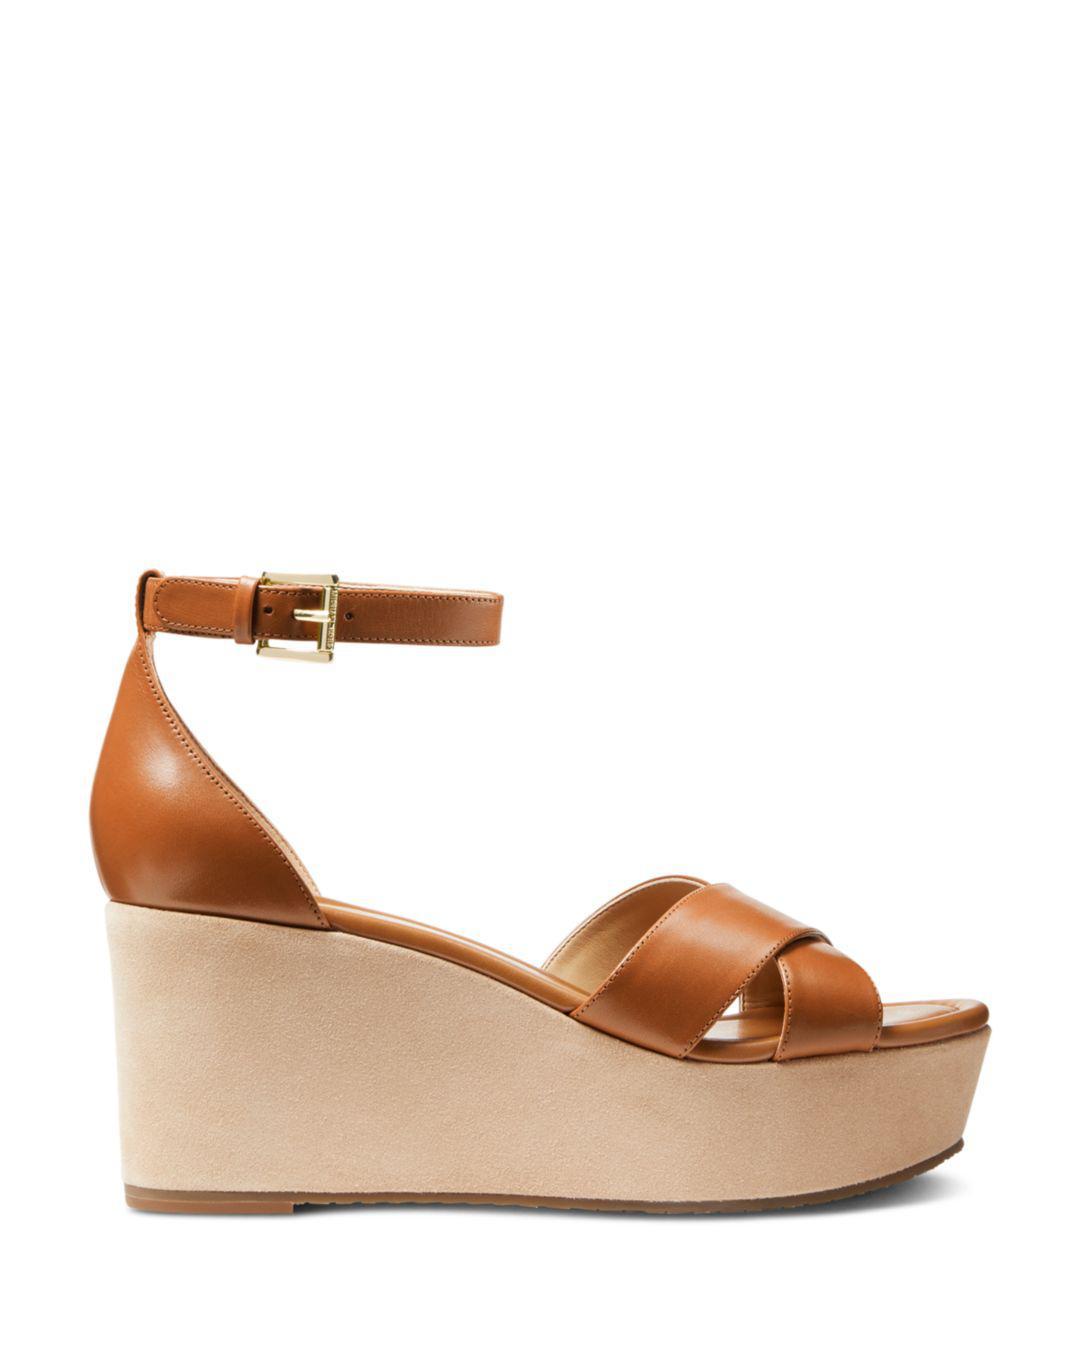 Desiree Wedge Sandals